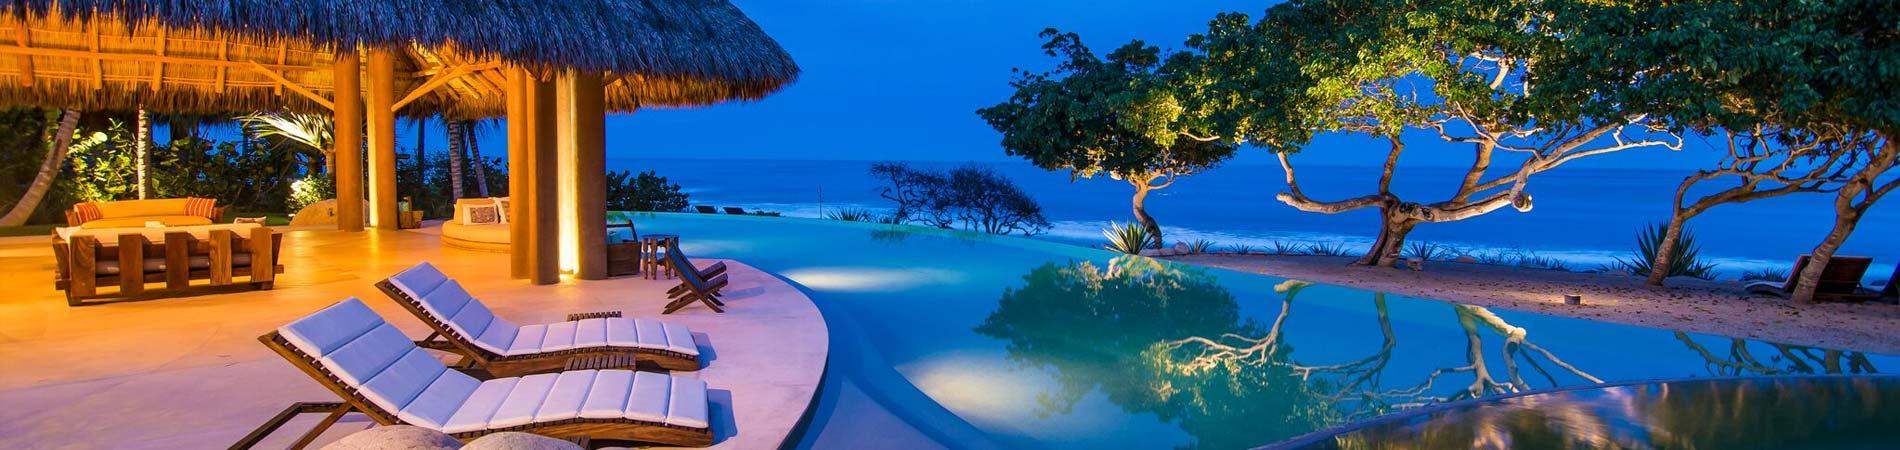 punta mita luxury beach villa – wellness & surf - journey mexico